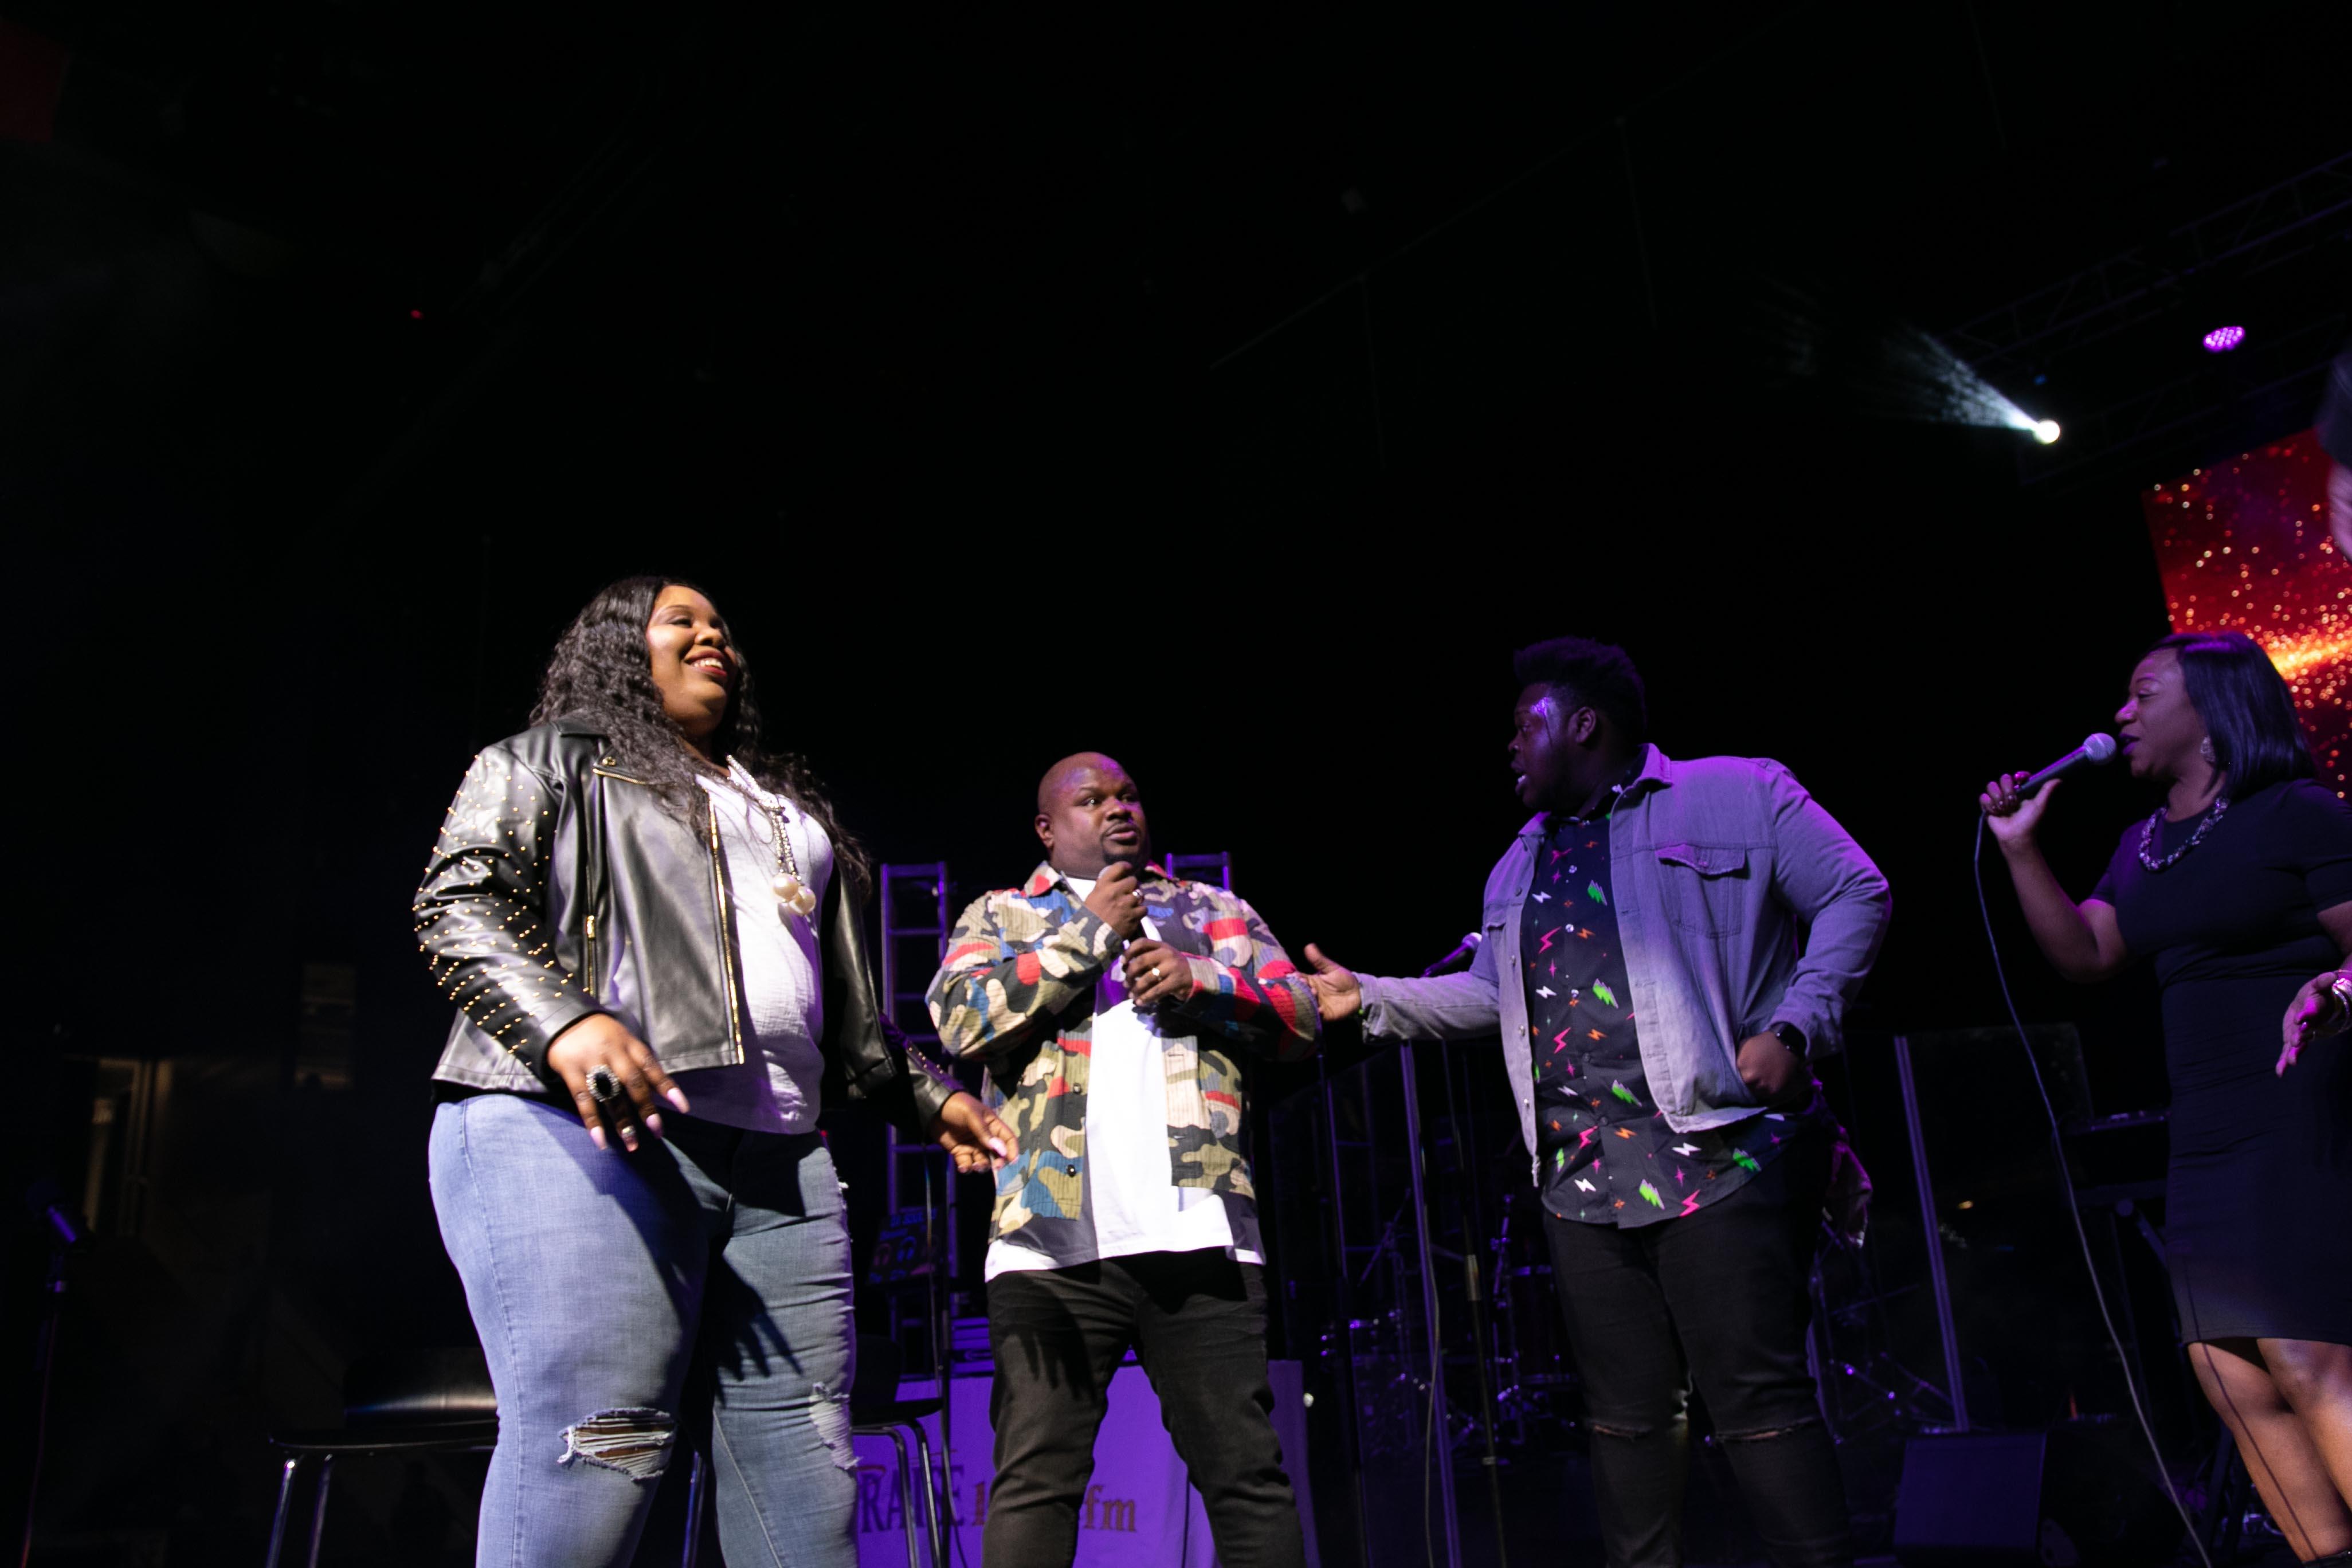 Tiffany Andrews, Melvin Crispell III & Josh Copeland At the 12th Annual Spirit Of Praise Celebration